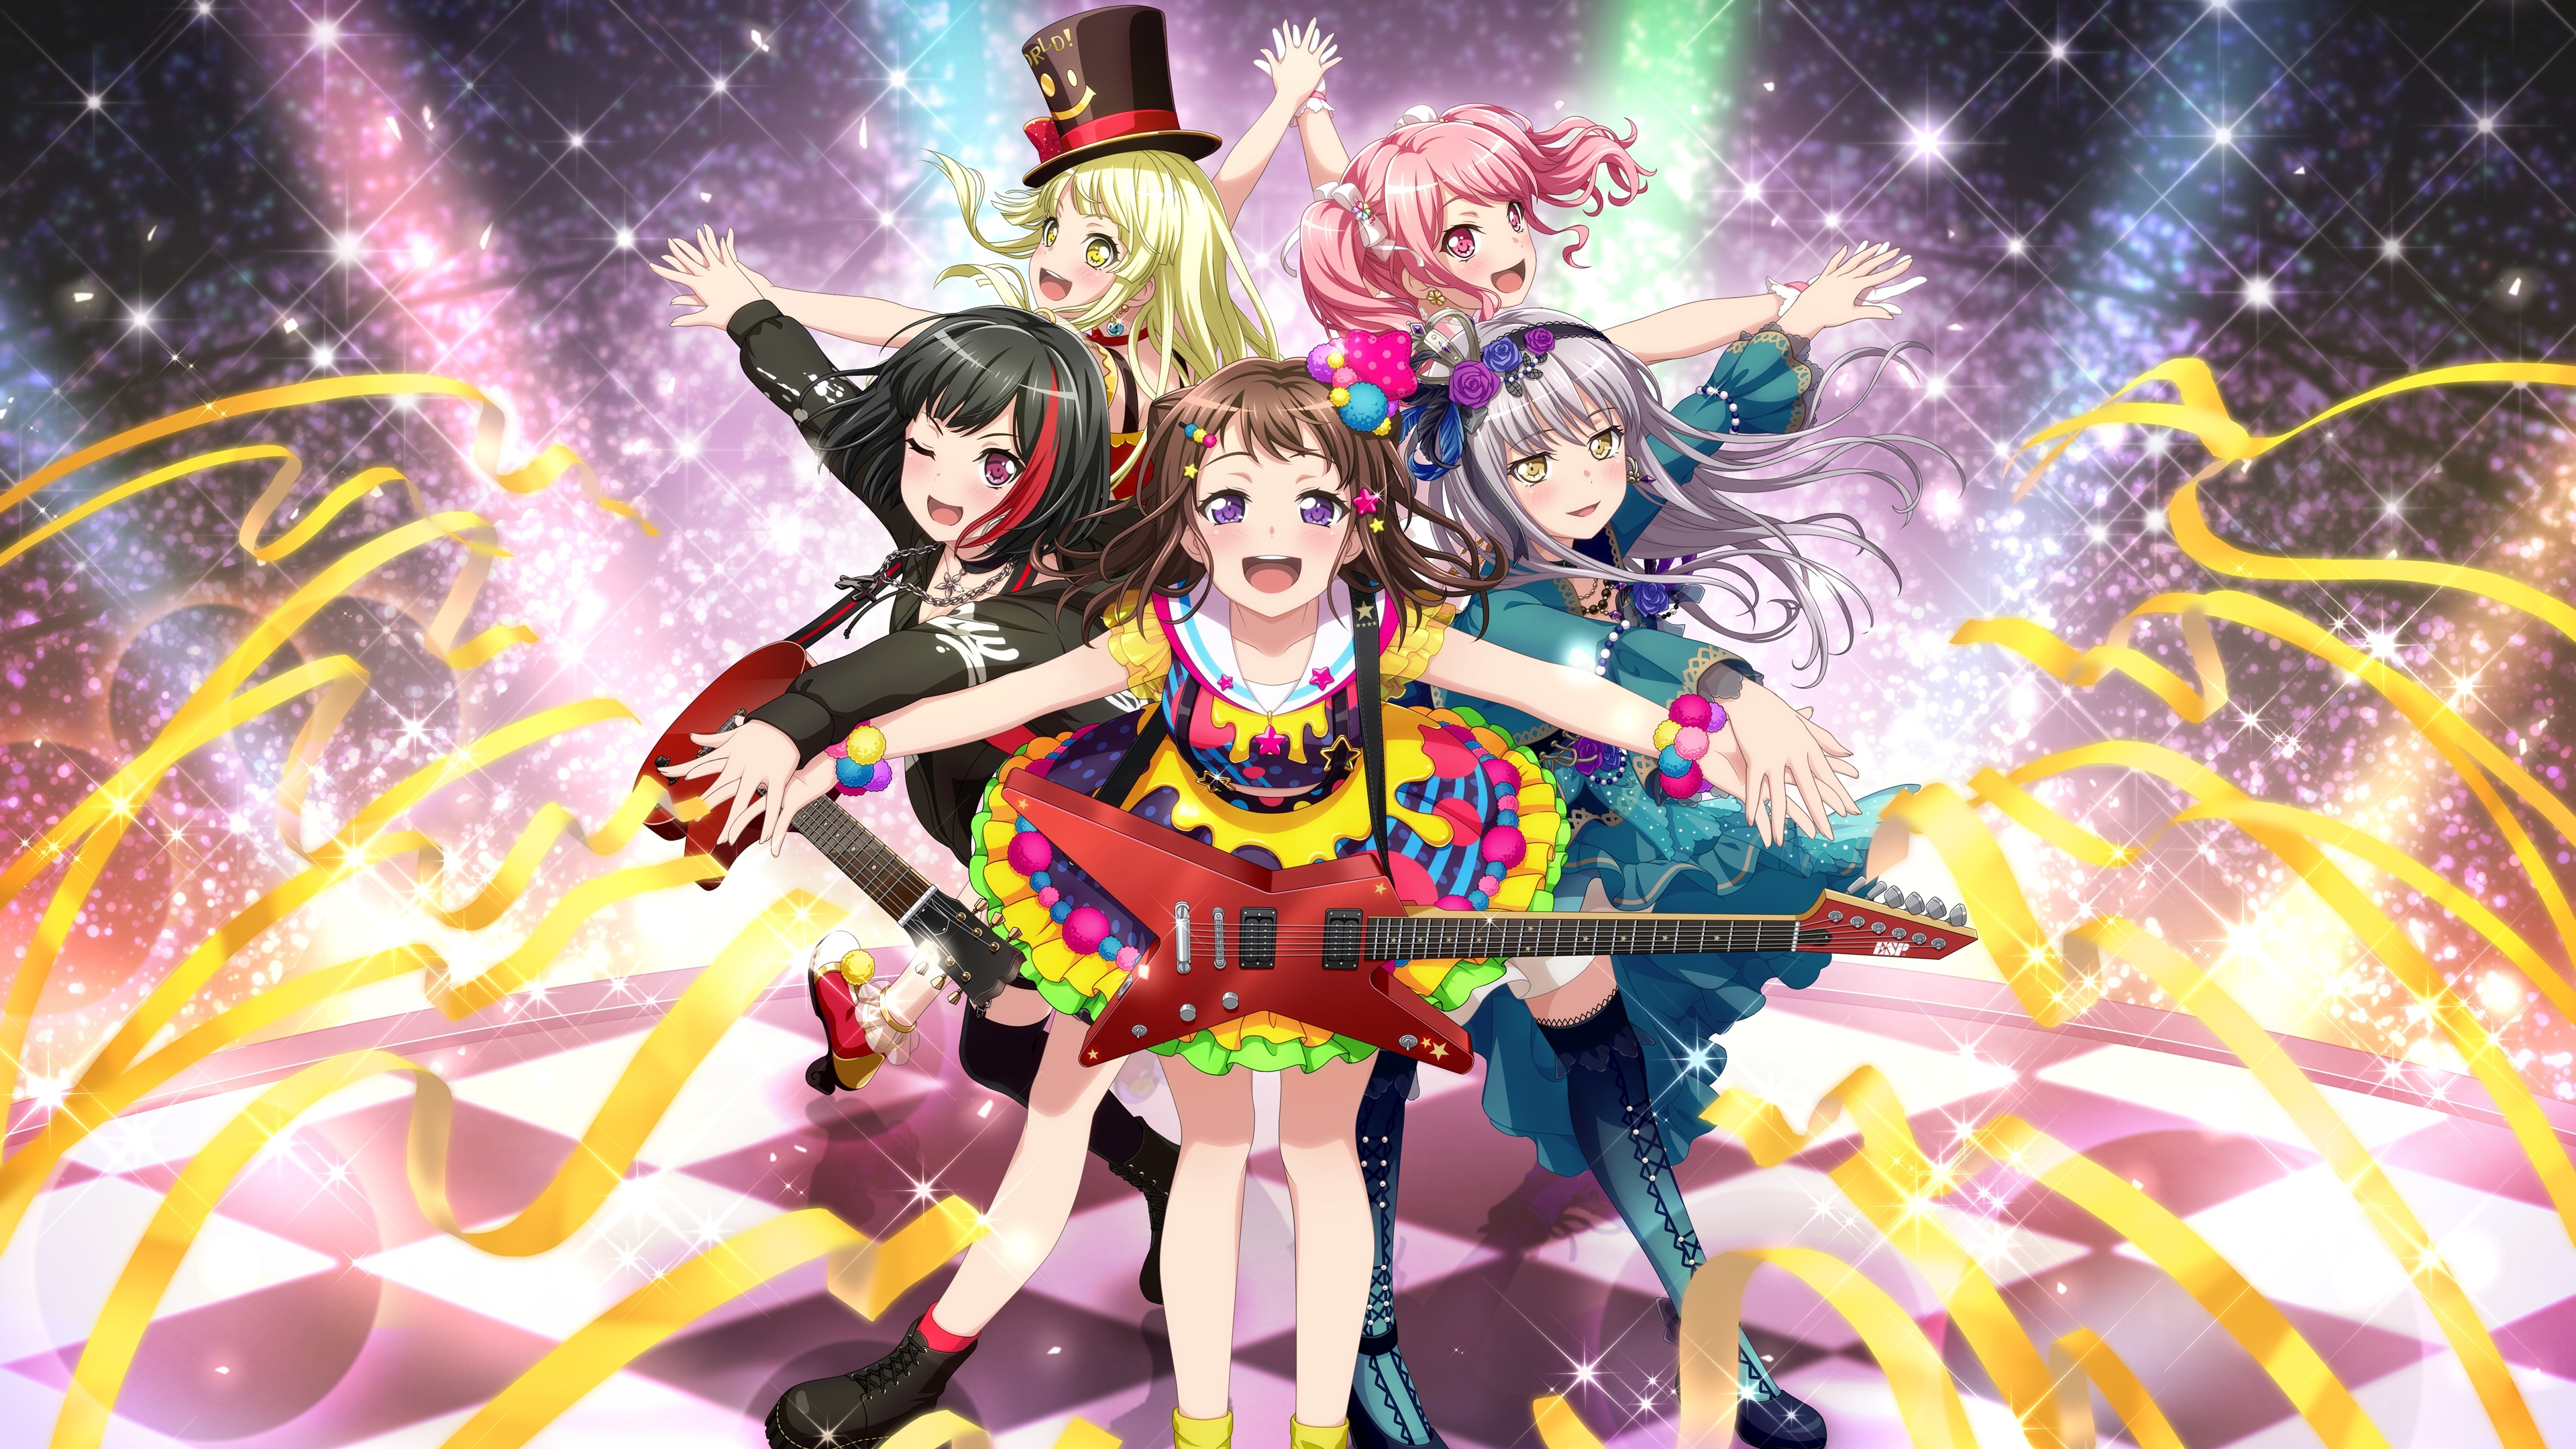 Bang Dream Film Live 4k壁紙 超高画質 3840 2160 6 アニメ4k壁紙